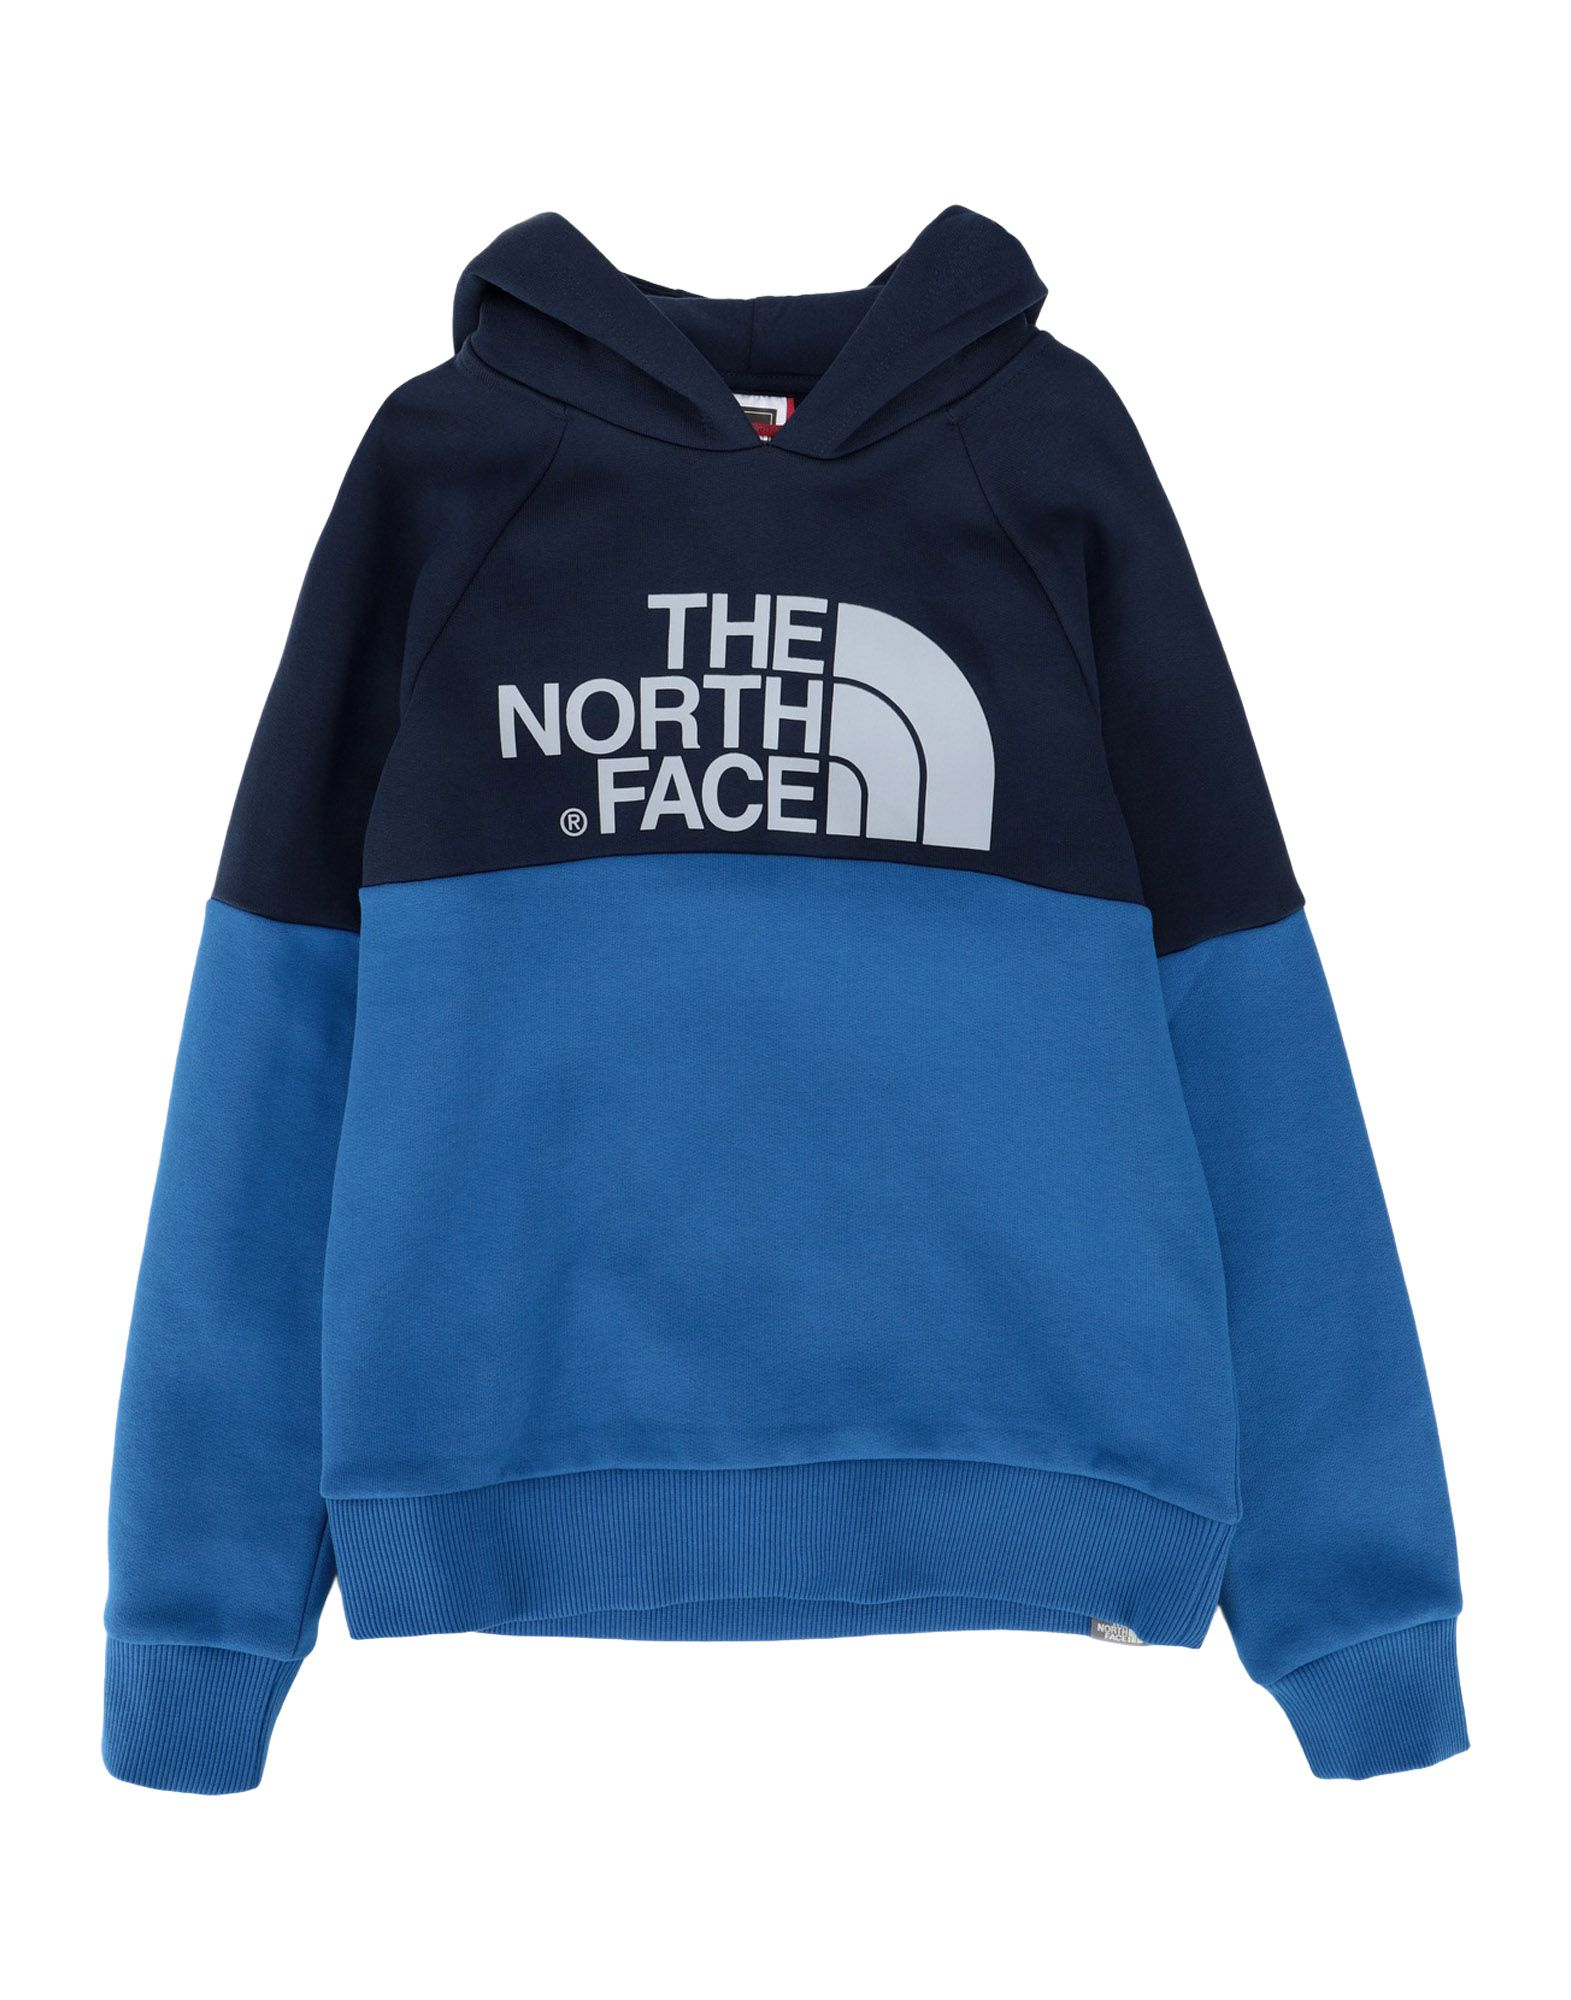 312e144a0 THE NORTH FACE Sweatshirt - Jumpers and Sweatshirts | YOOX.COM